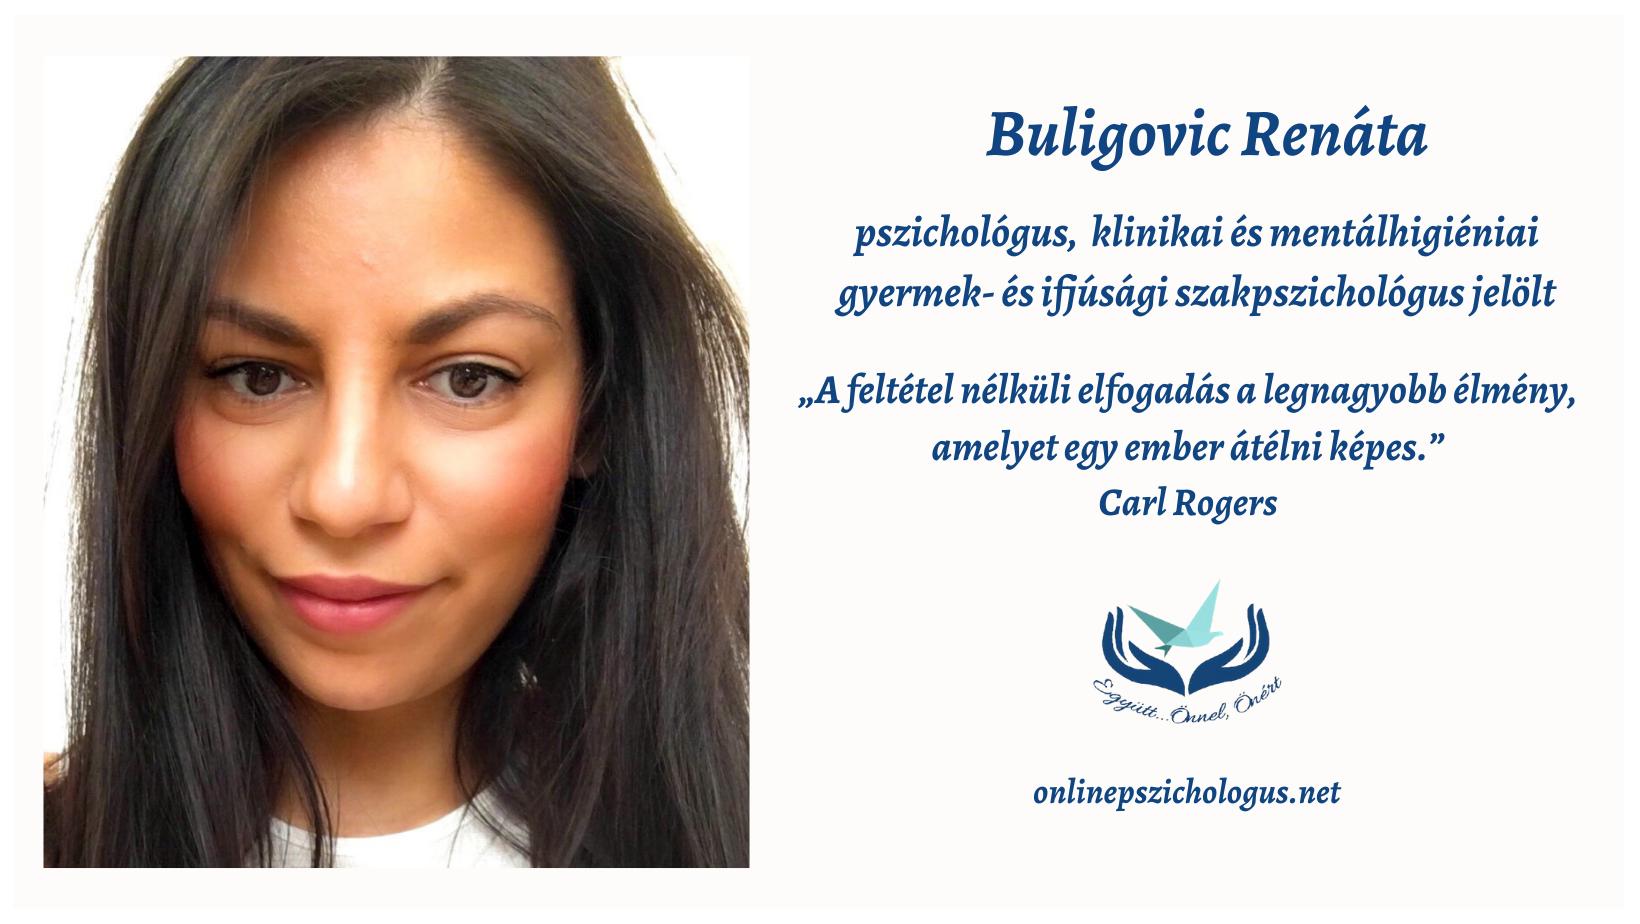 Interjú Buligovic Renáta pszichológussal